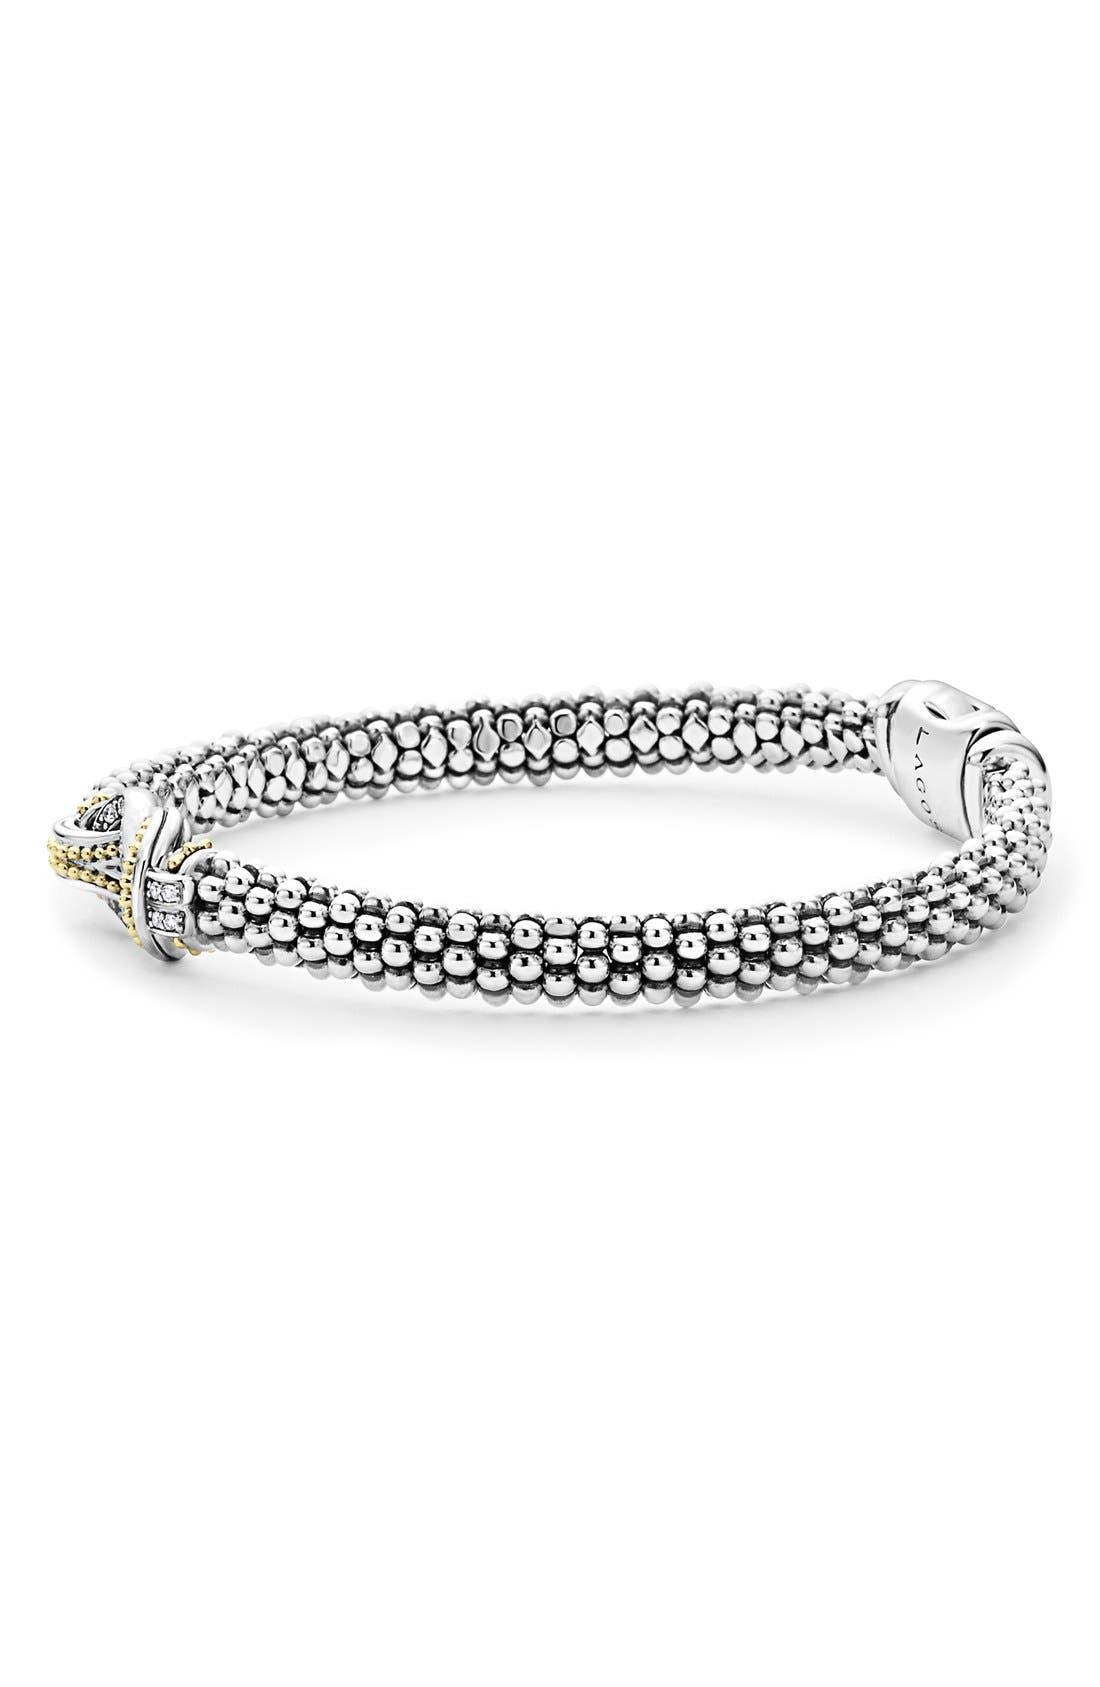 'Newport' Diamond Knot Bracelet,                             Alternate thumbnail 7, color,                             SILVER/ GOLD